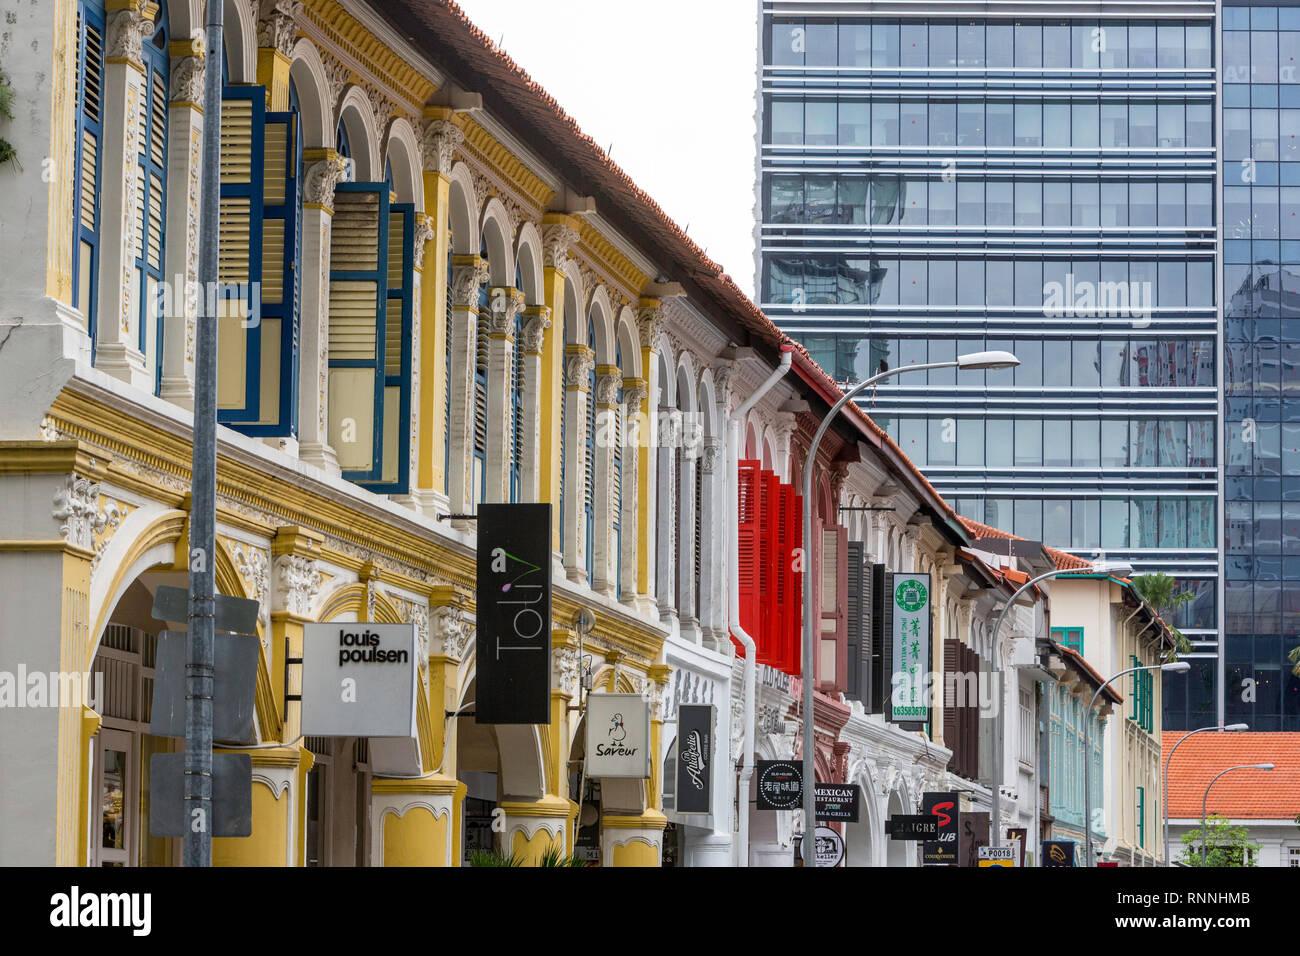 Colonial Era vs. Modern Era Architecture, Singapore. - Stock Image